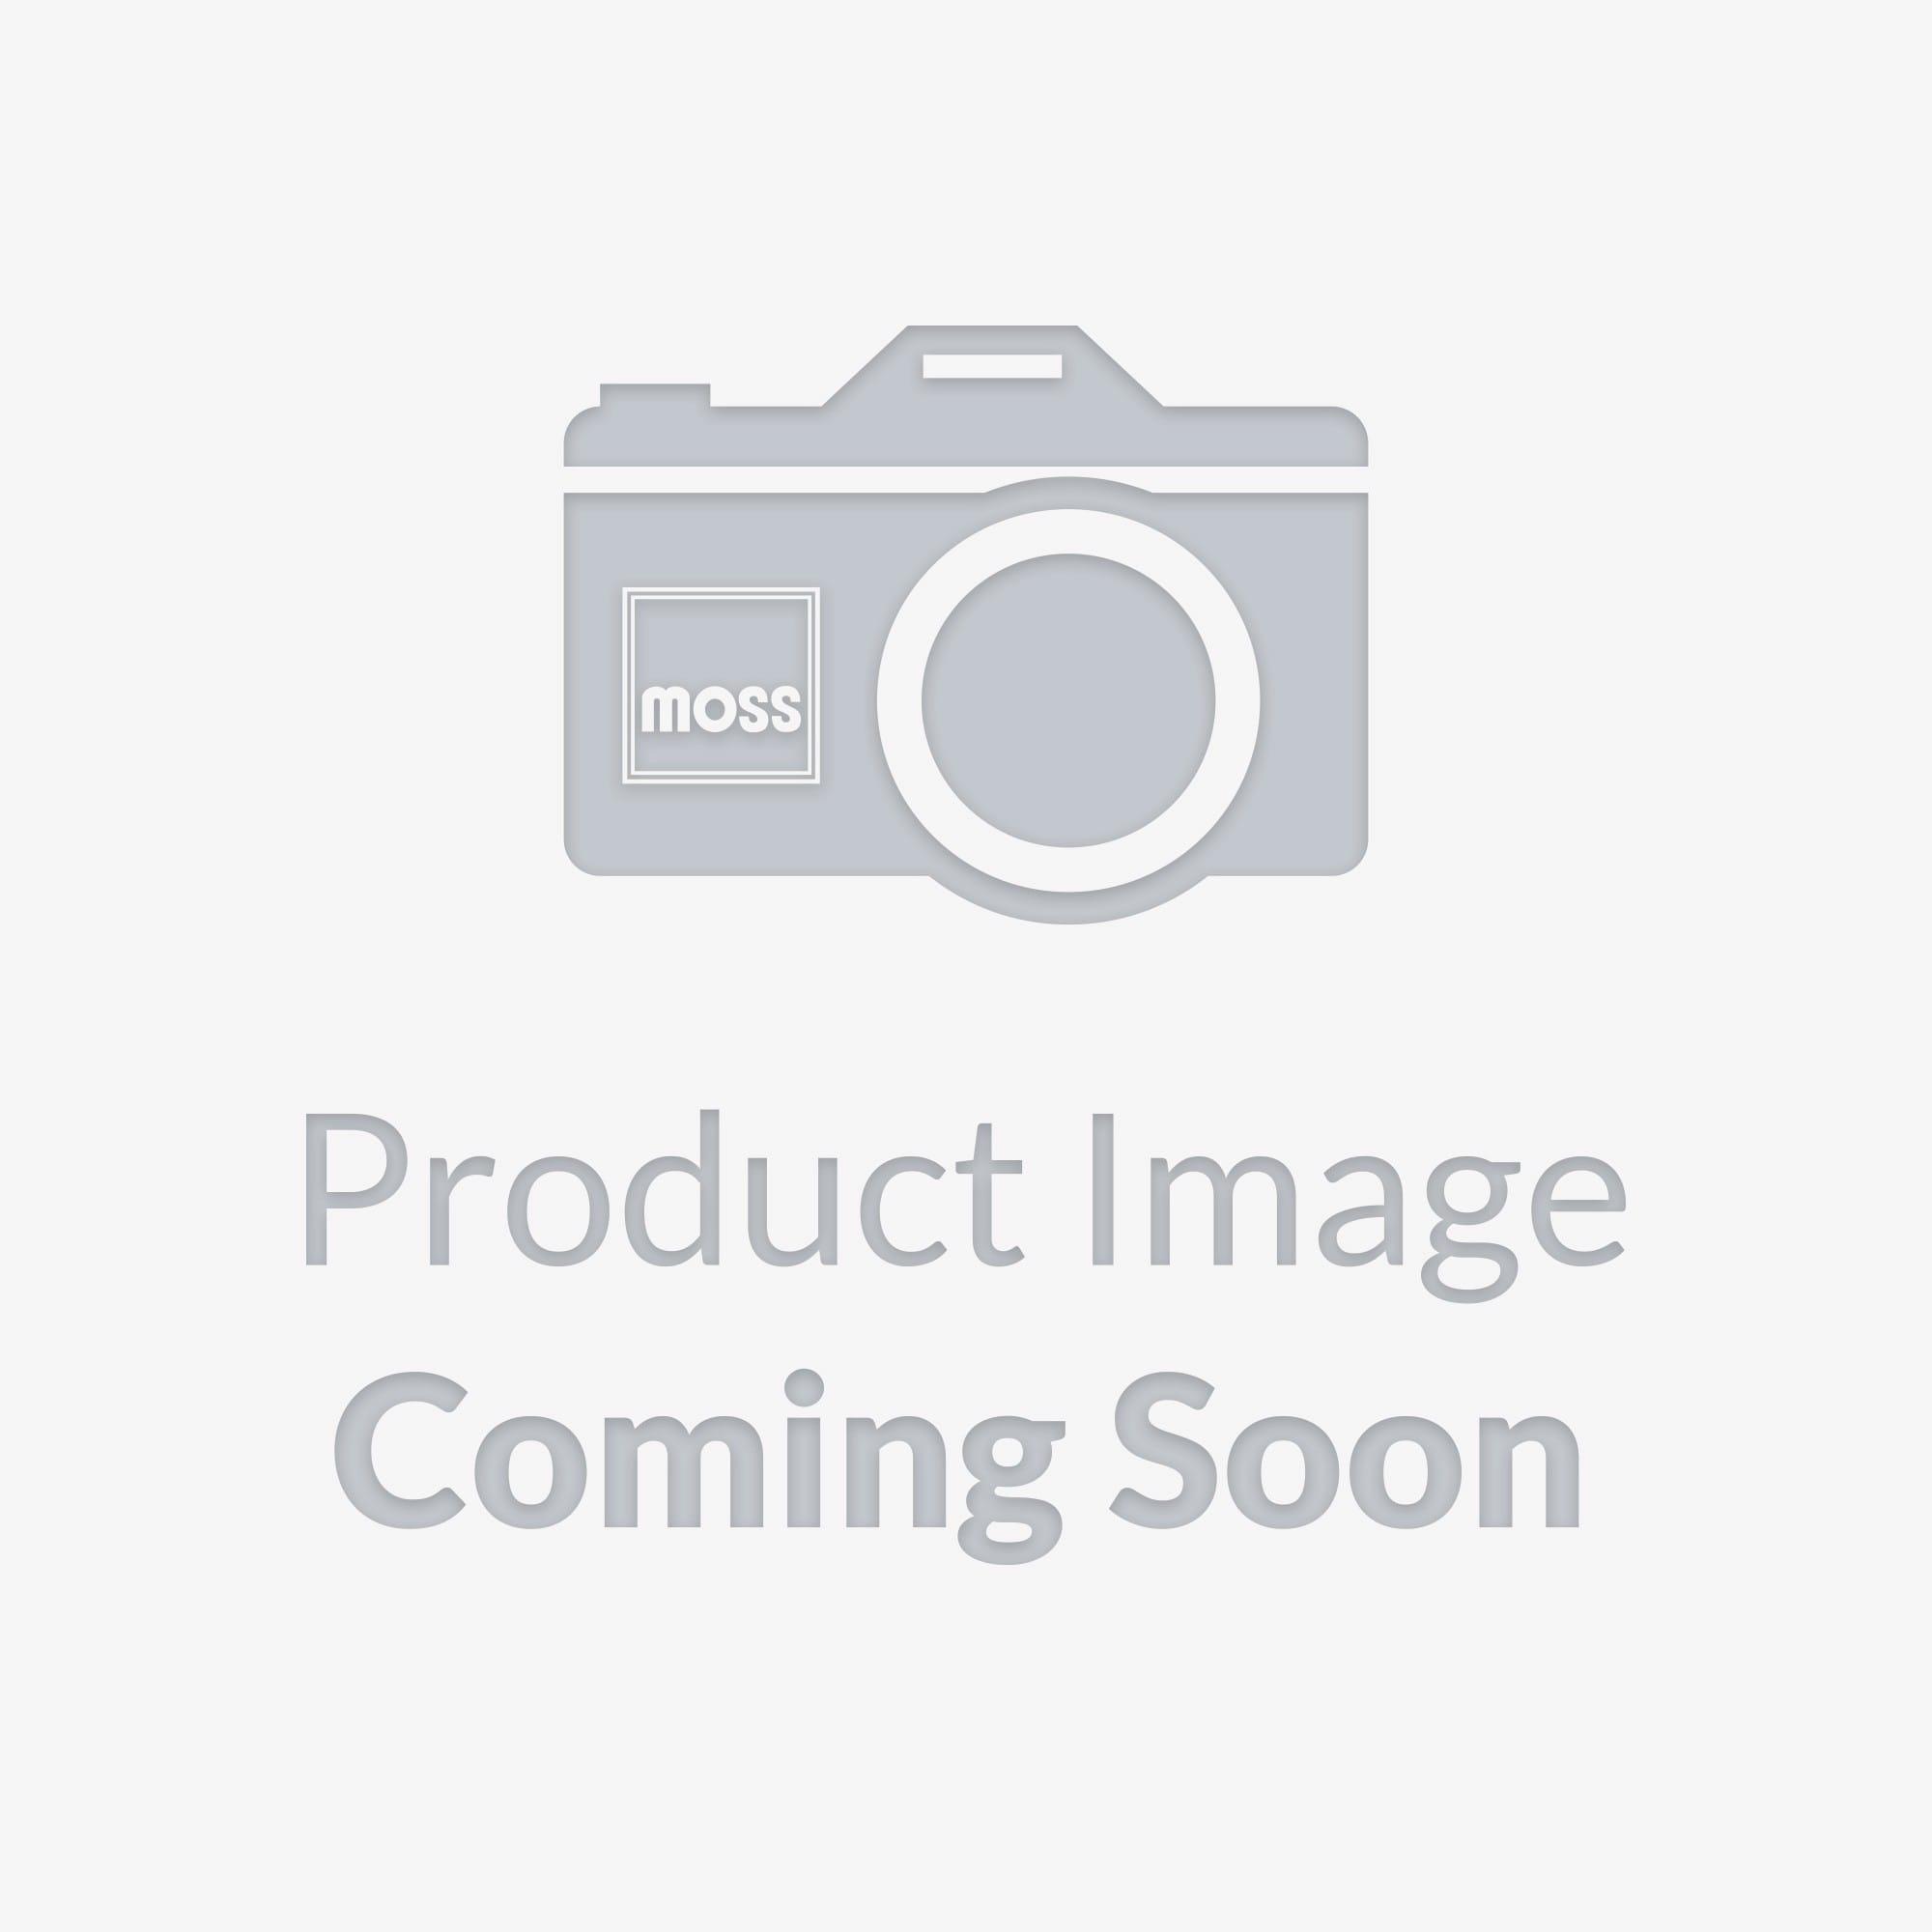 1966 Mgb Wiring Diagram besides 1966 Mgb Wiring Diagram besides 19 Mgtc Wire Wheels moreover Brake Pipe Sets 8 likewise Free. on moss motors mgb